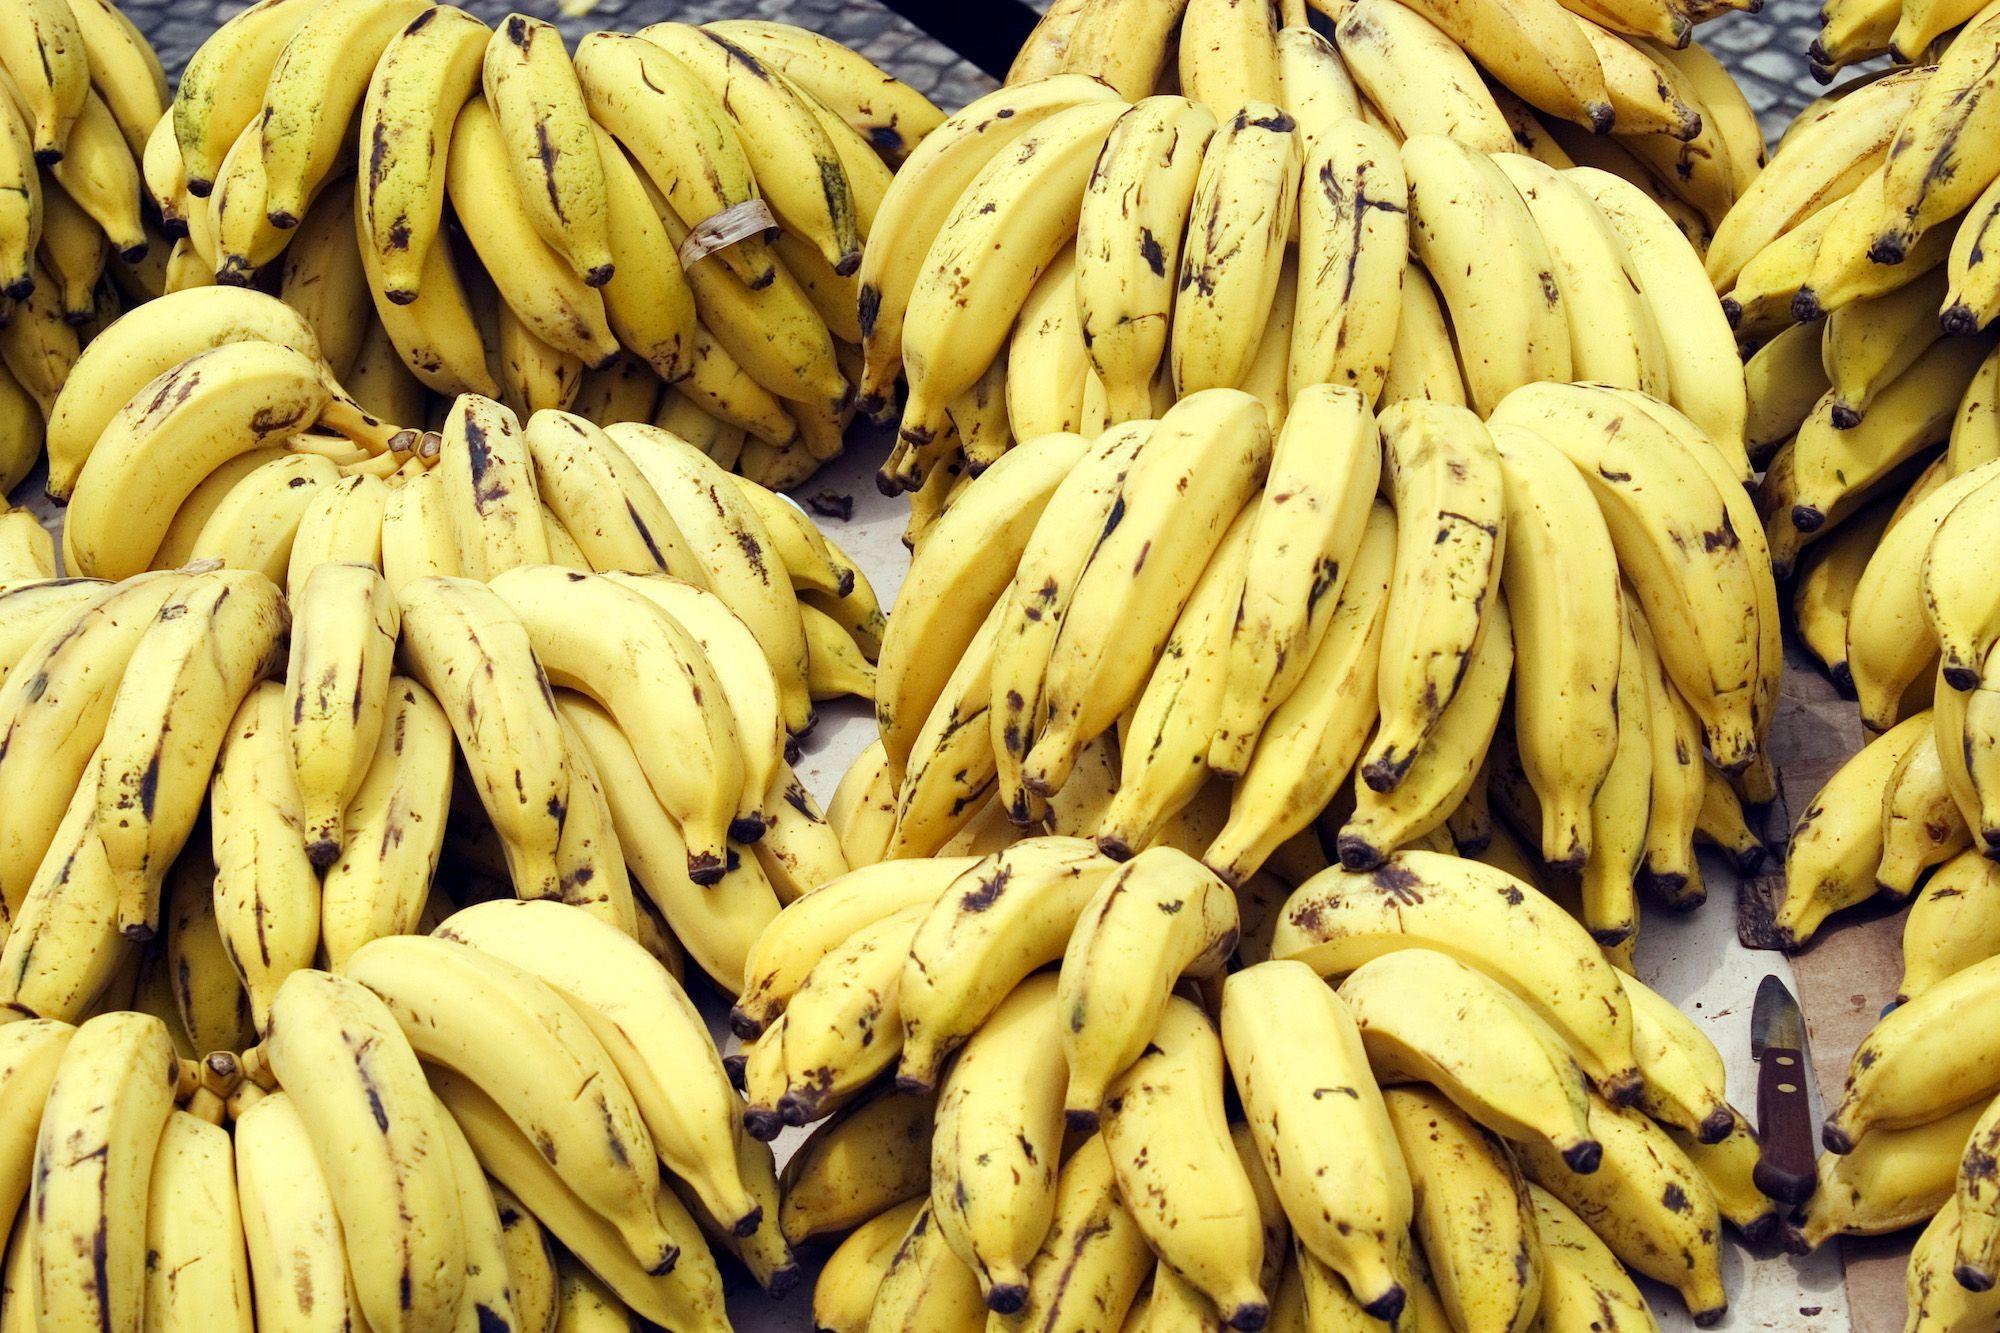 banana க்கான பட முடிவு